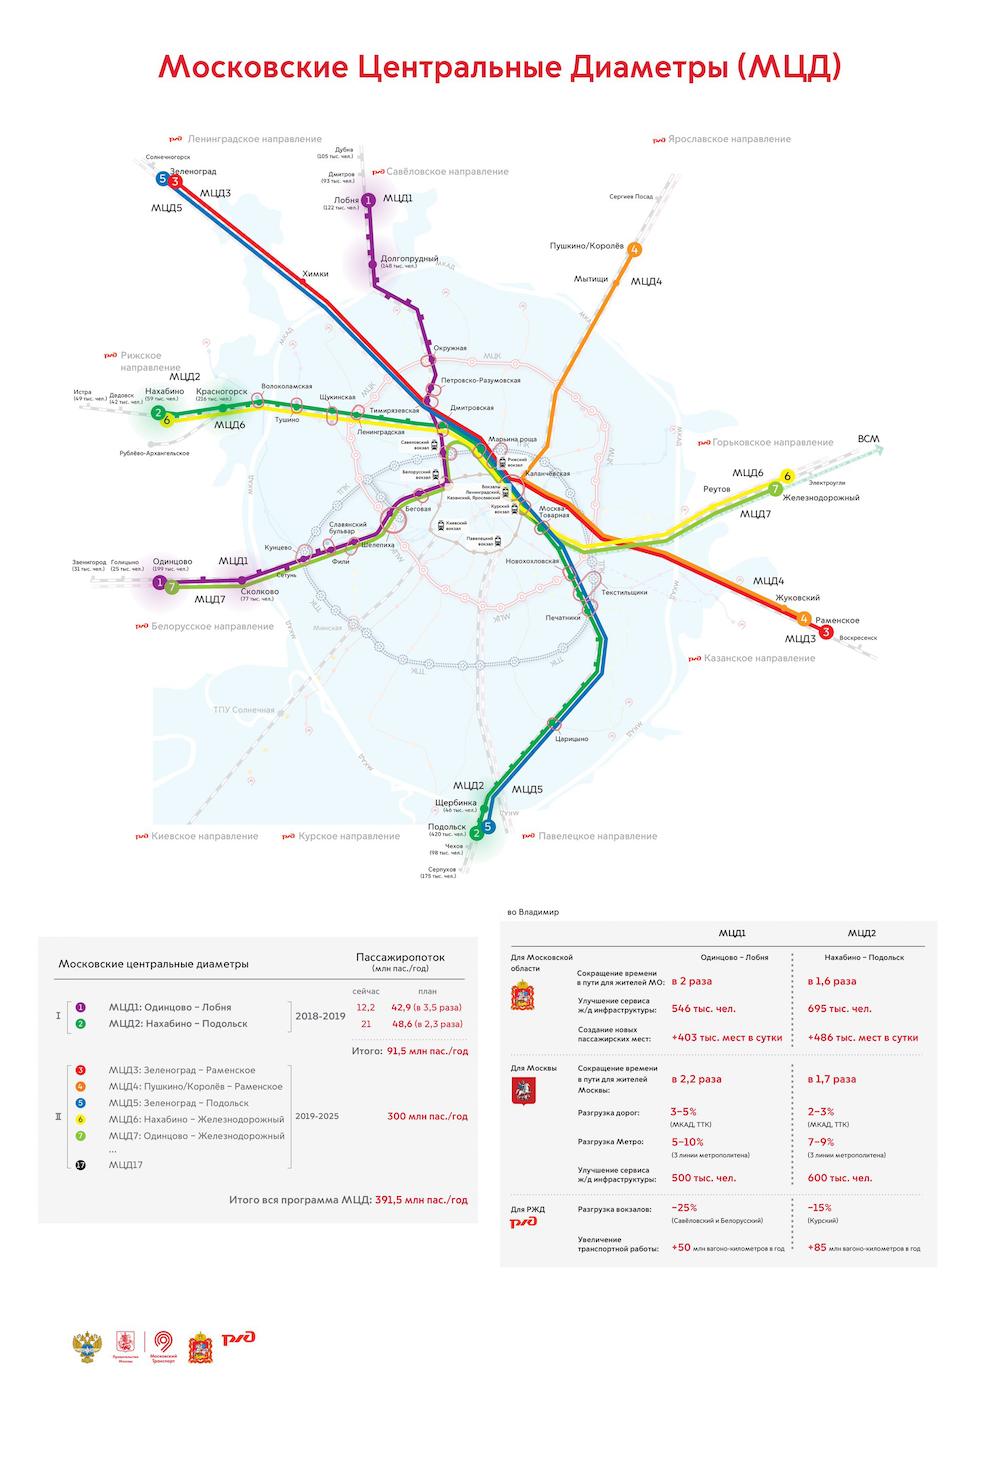 Moscow Central Diameters Future Map (November 2017) © Московские центральные диаметры (МЦД), 2017